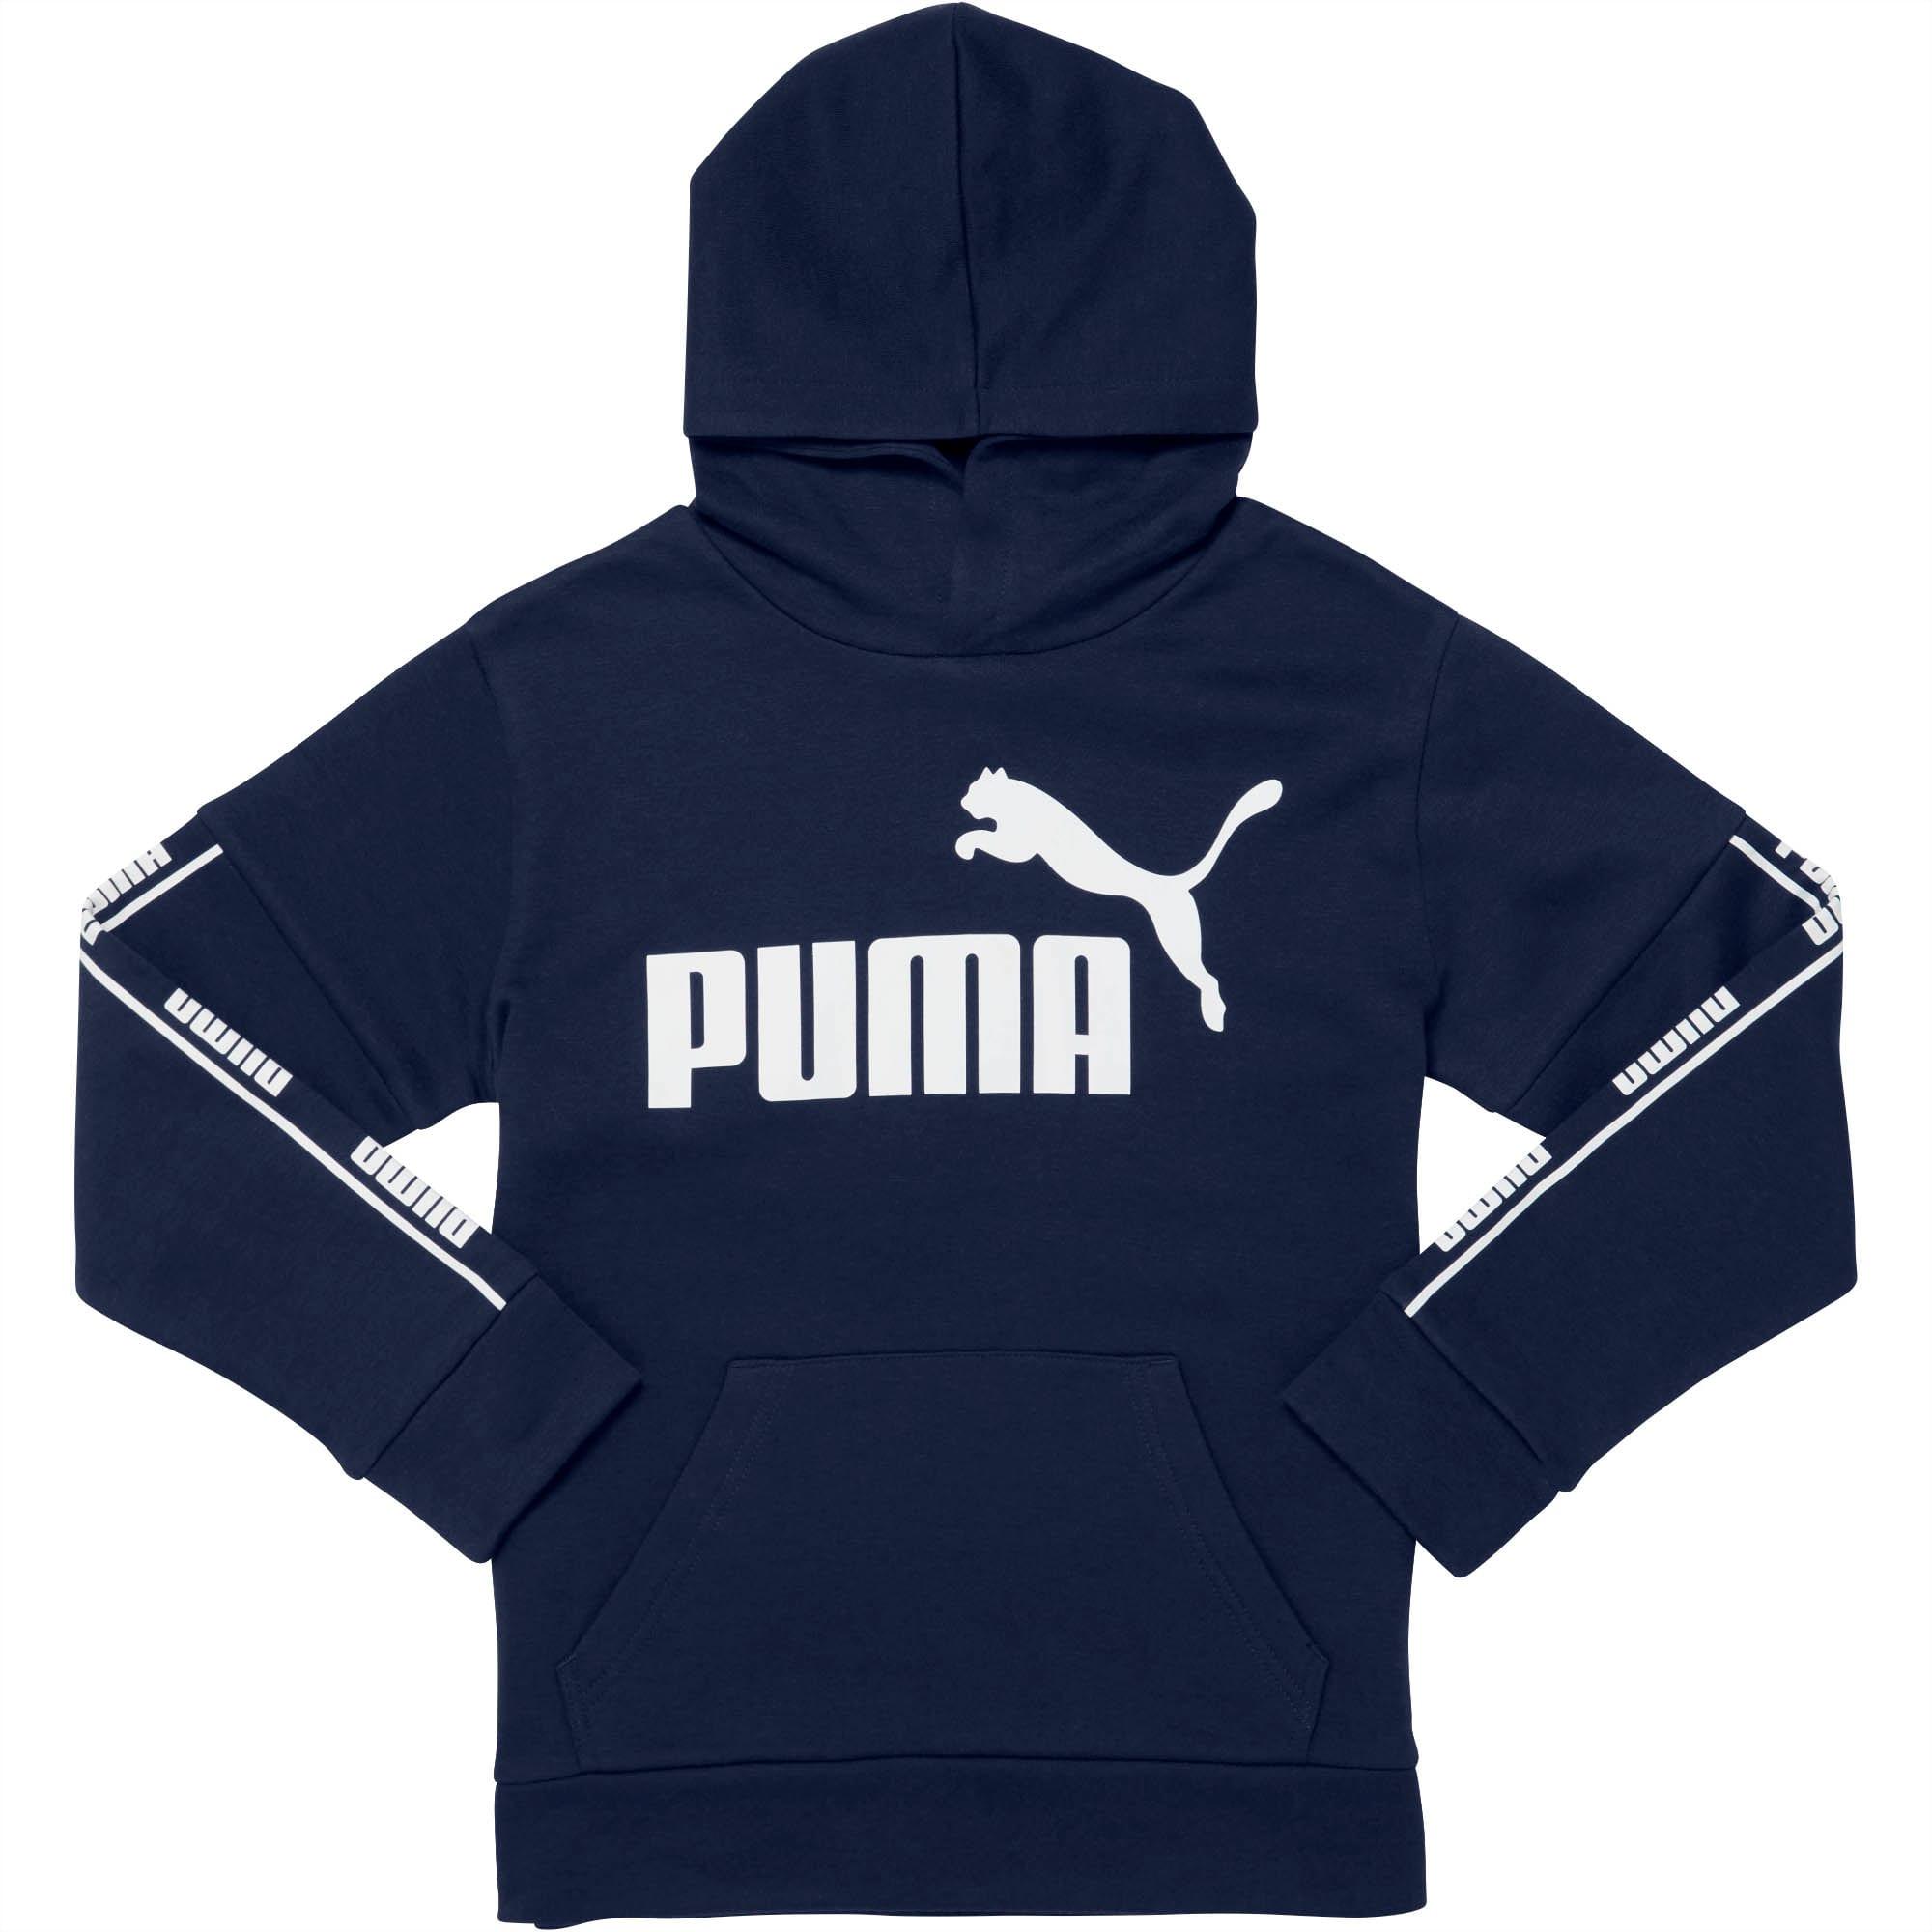 PUMA Boys Boys Fleece Hoodie Hooded Sweatshirt